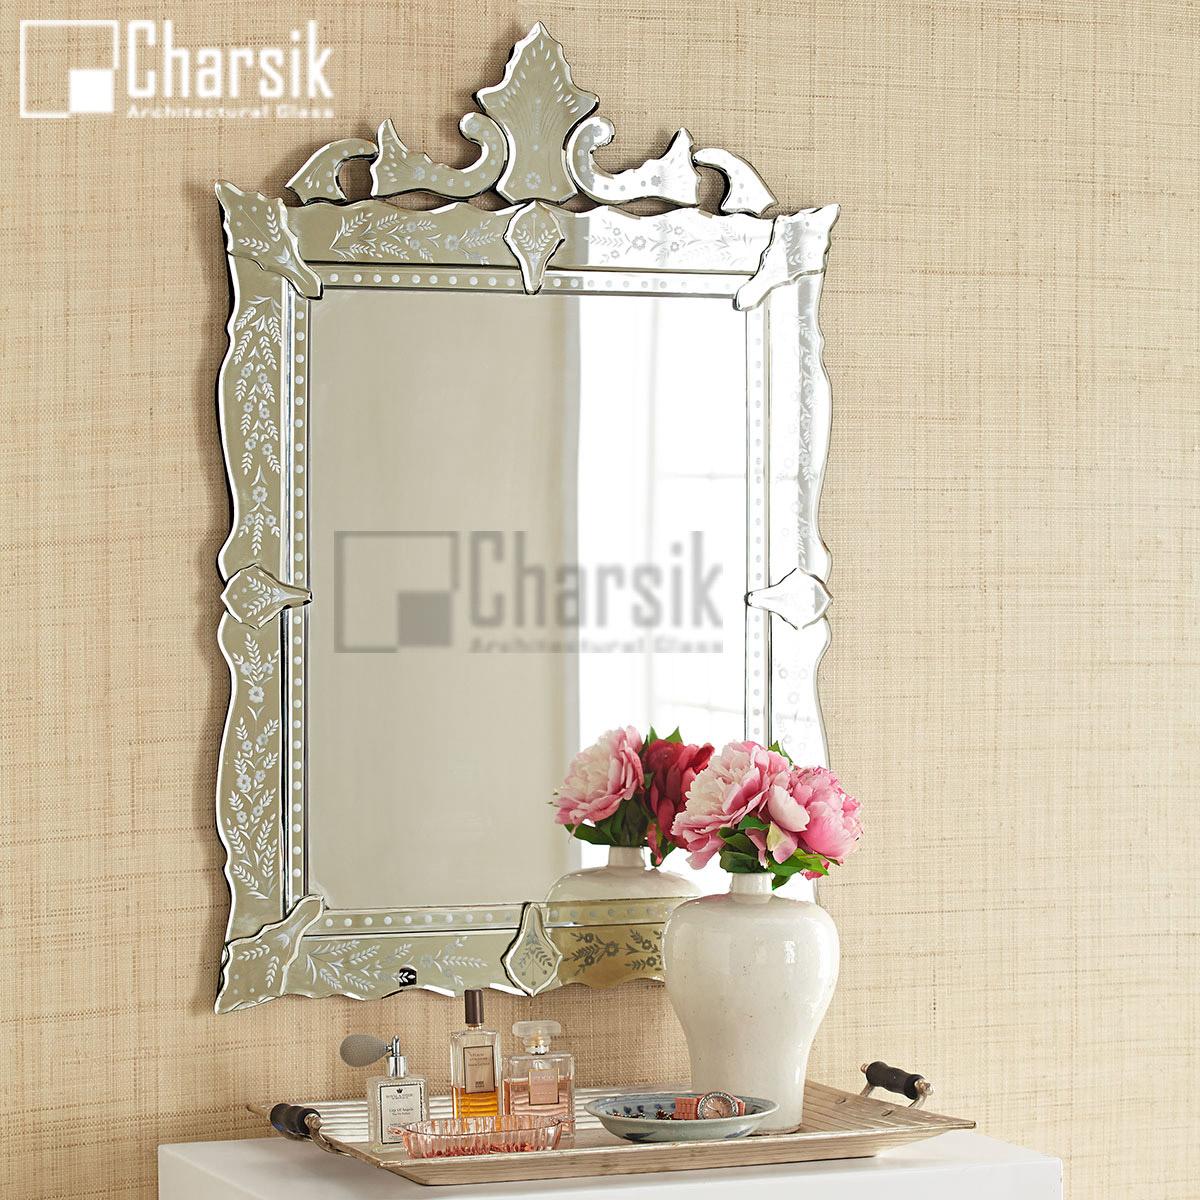 آینه ونیزی طرح مونالیزا چارسیک